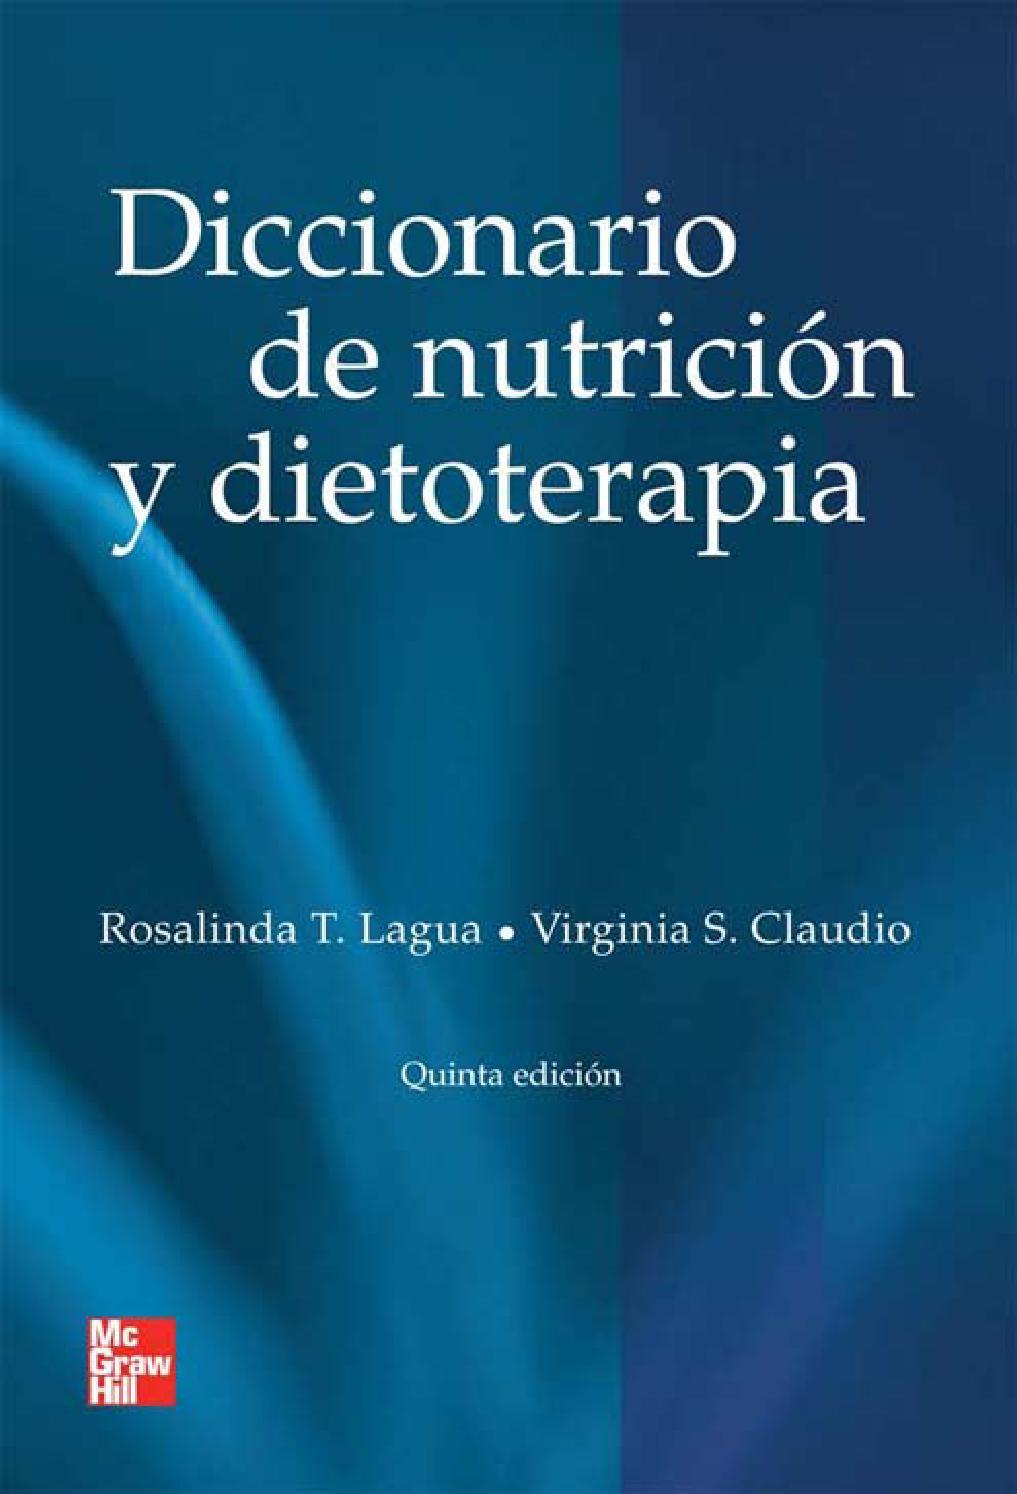 dieta de hipertensión intracraneal idiopática con corticosteroides